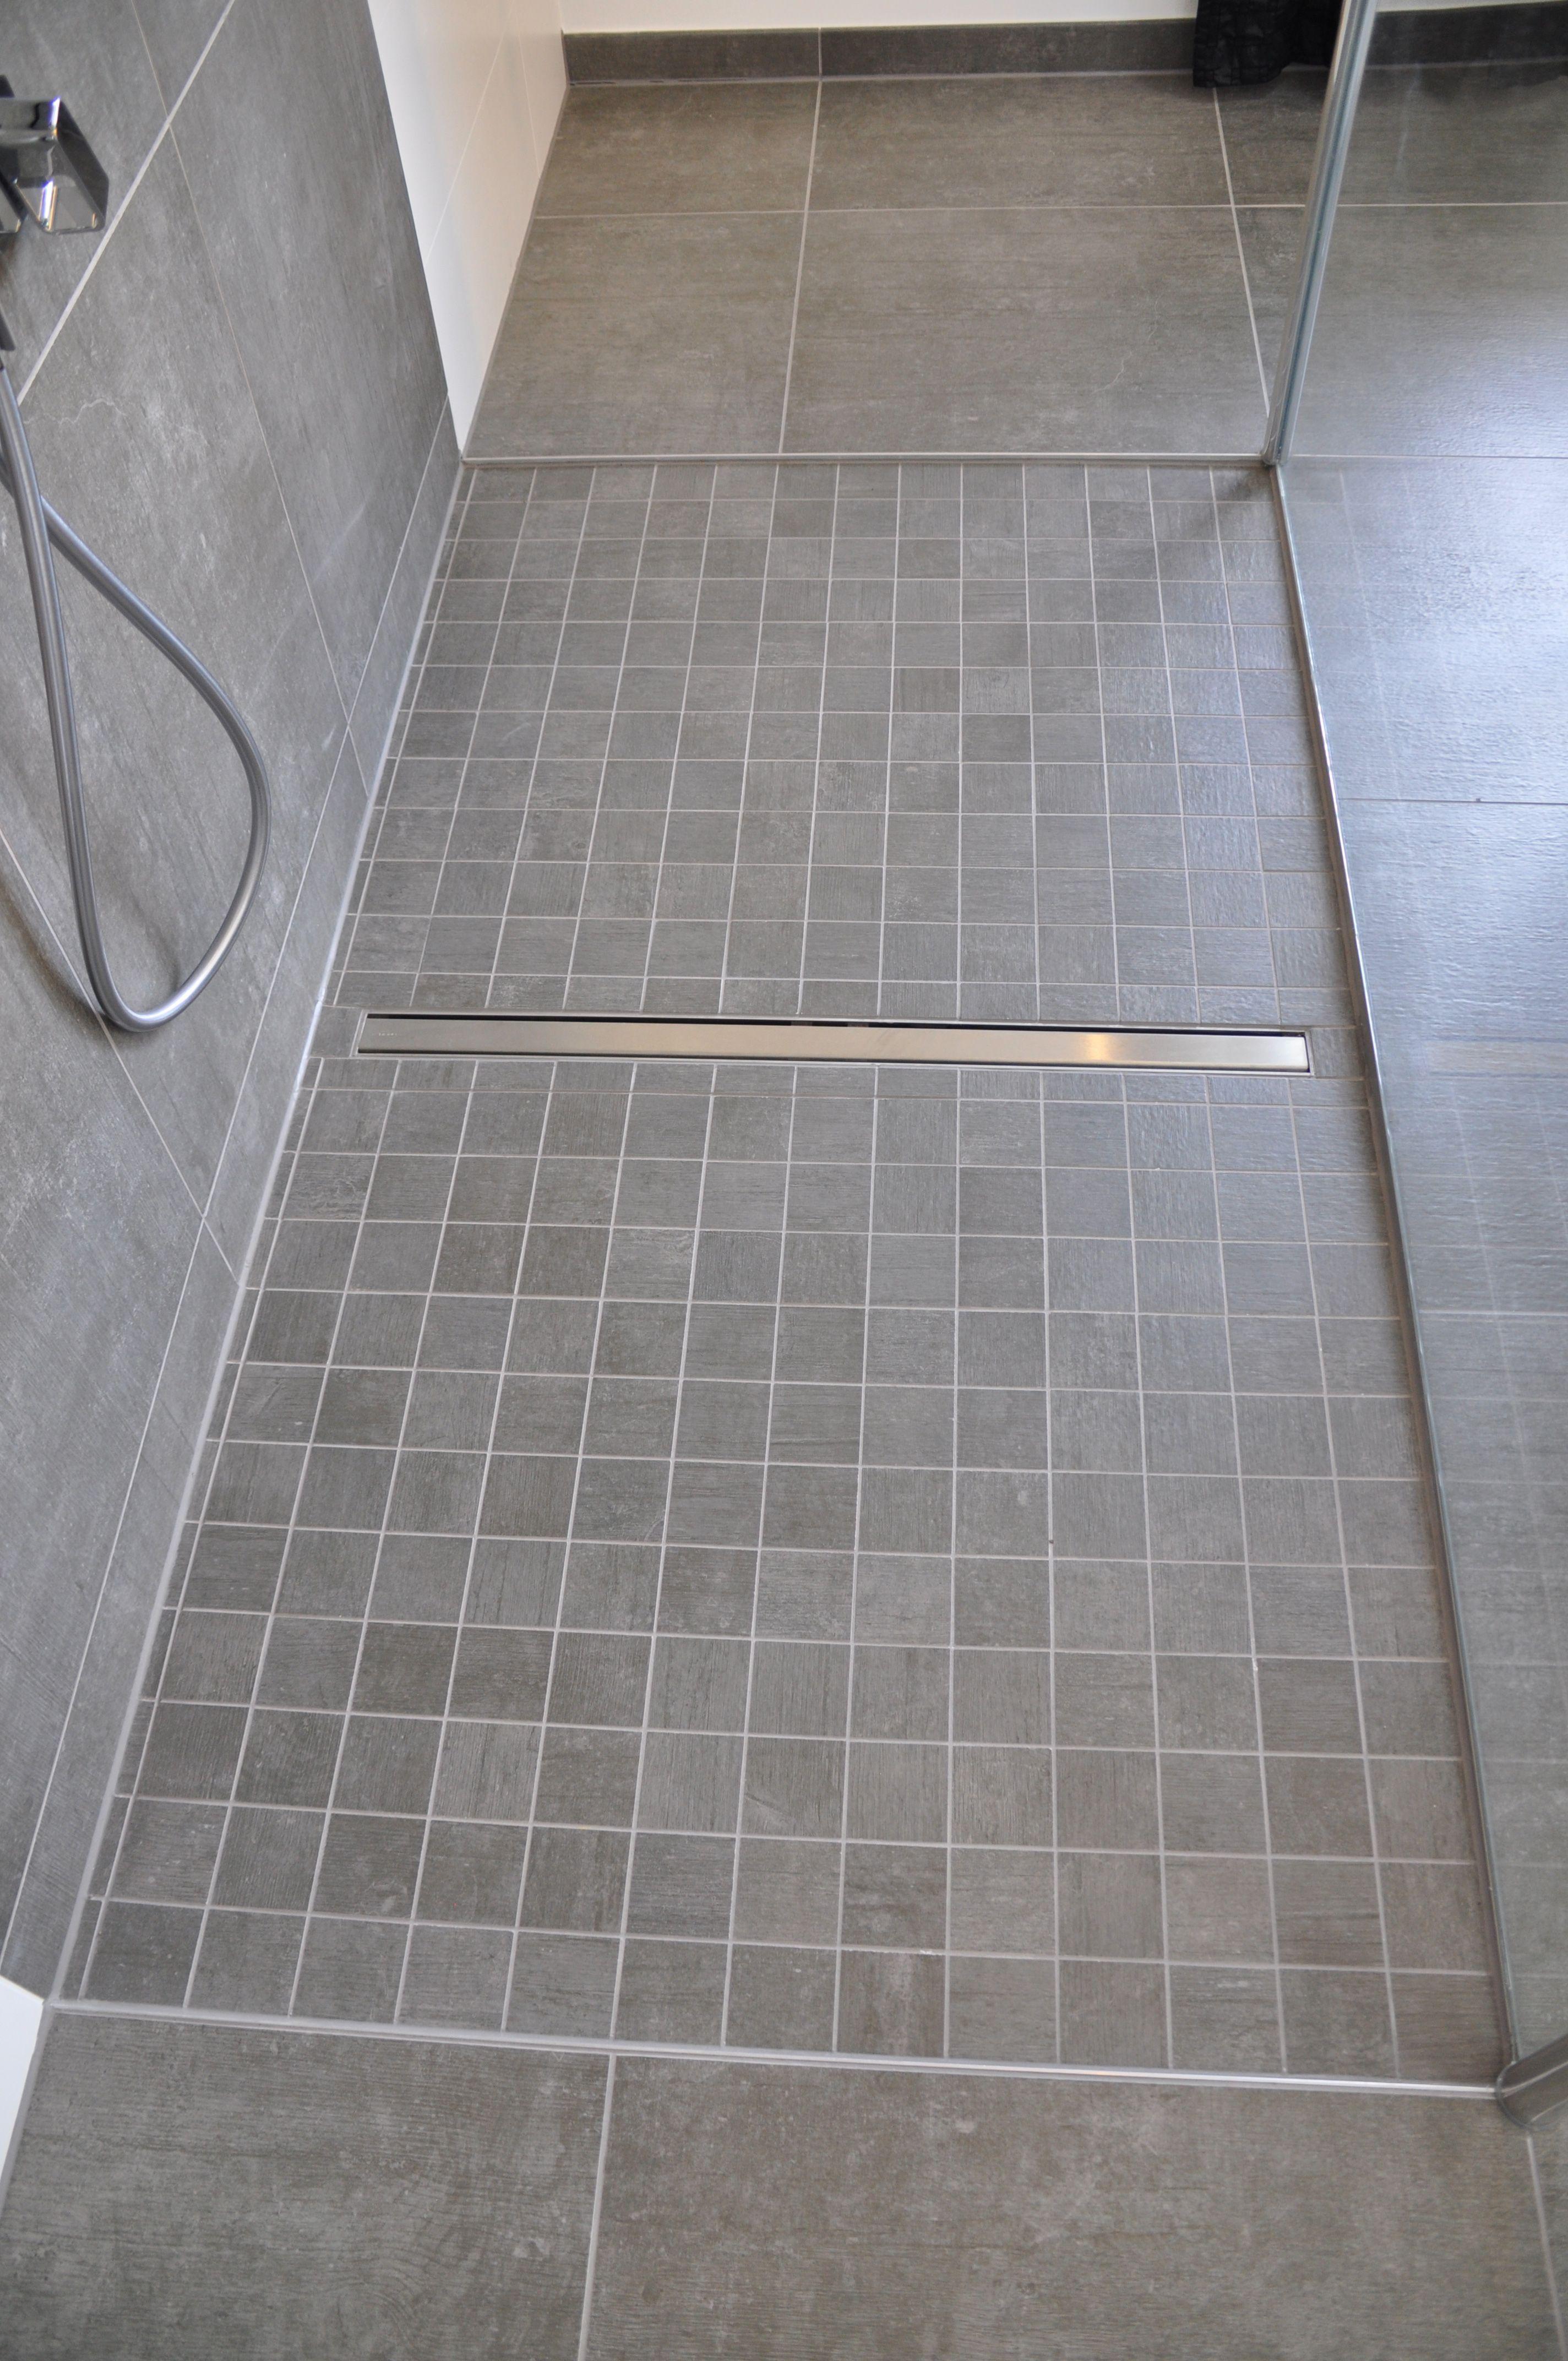 Bodenebene Dusche mit Mosaik Villeroy & Boch Upper Side in ...